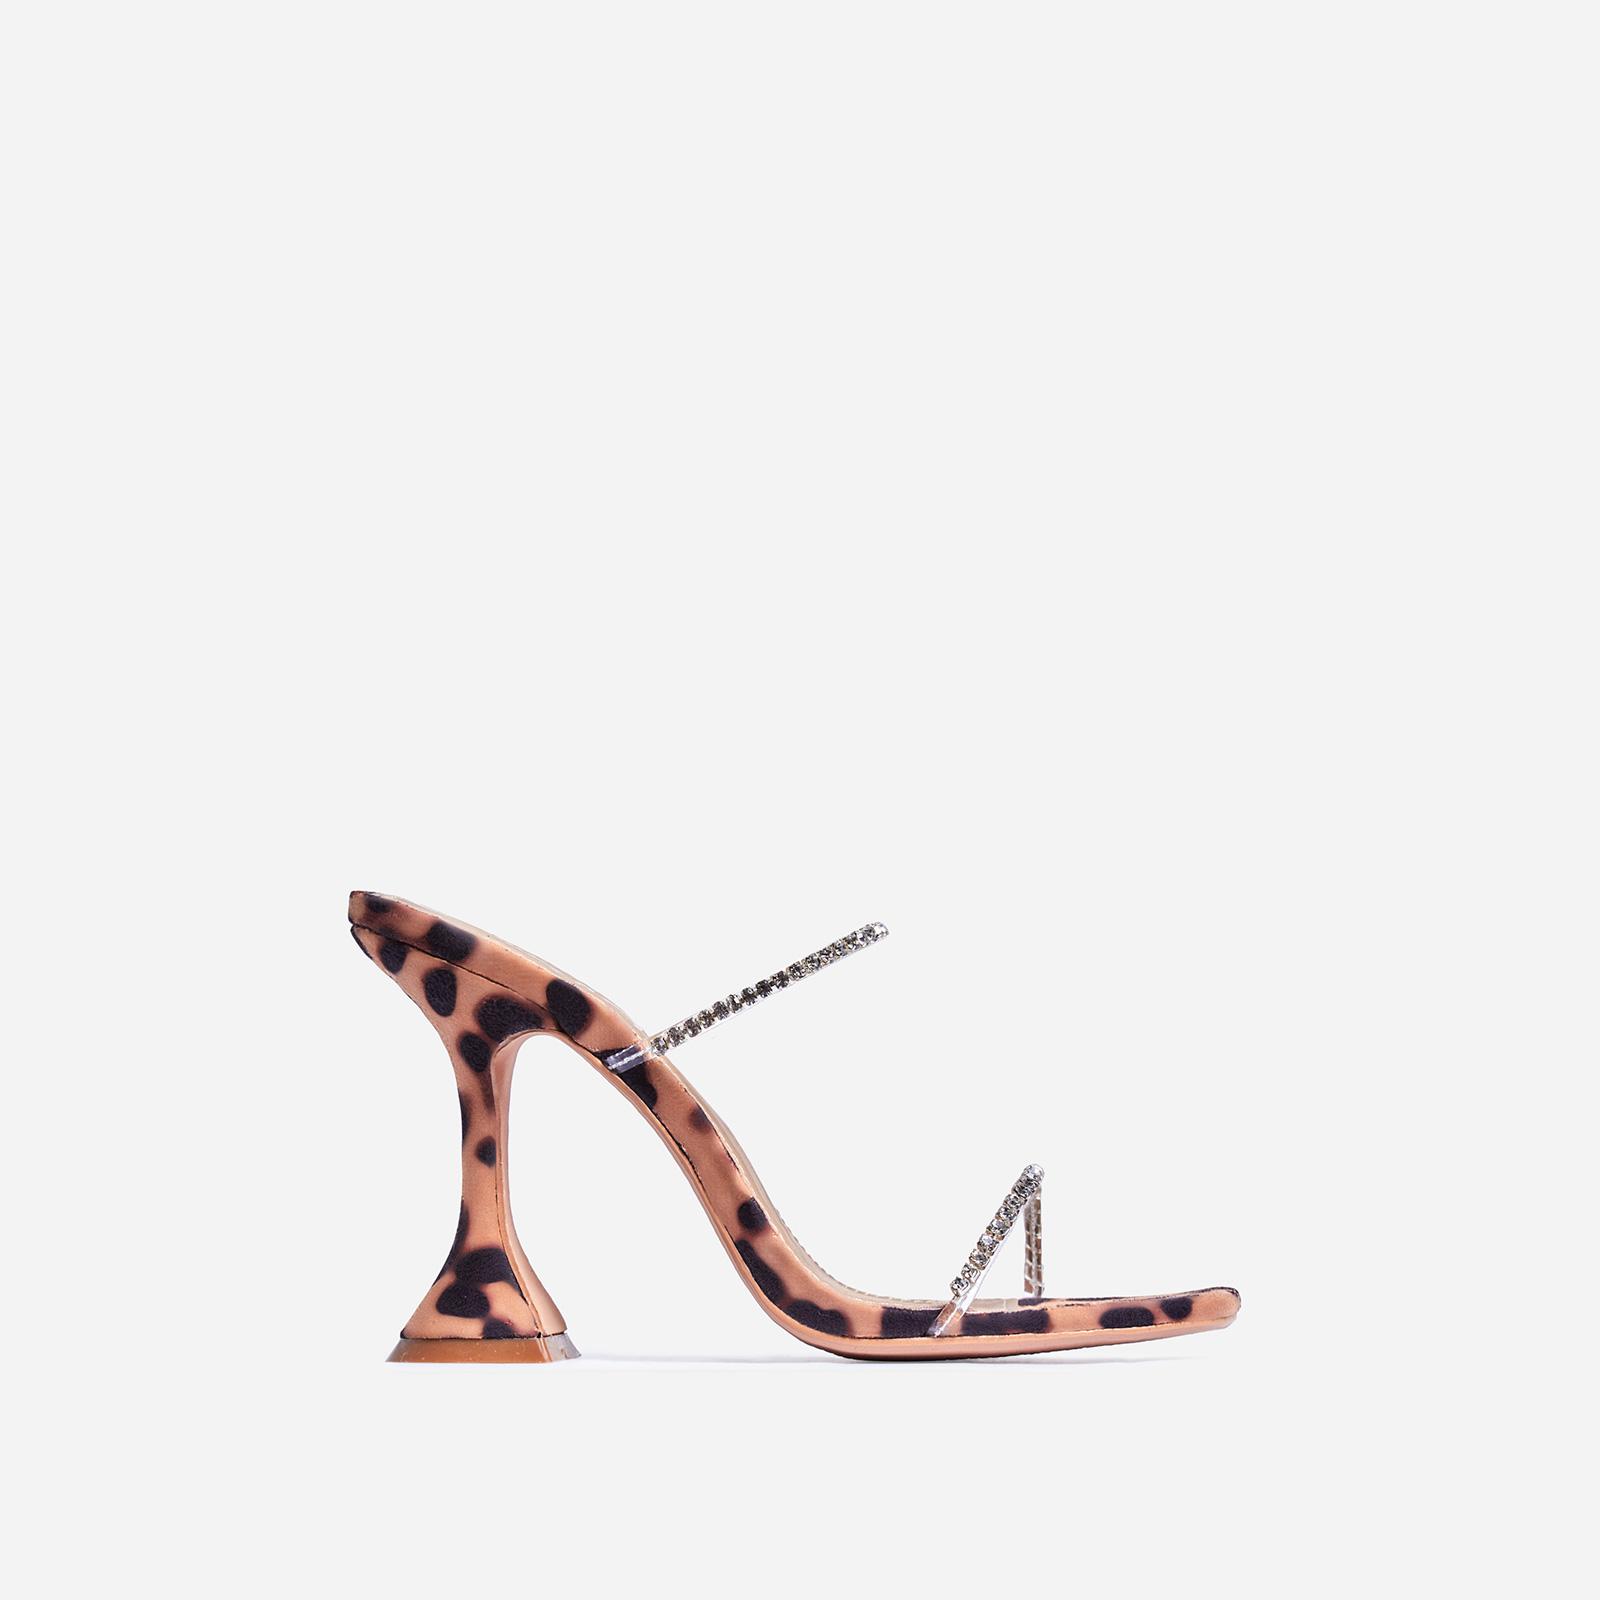 Dreams Diamante Detail Pyramid Heel Mule In Tan Leopard Print Faux Suede